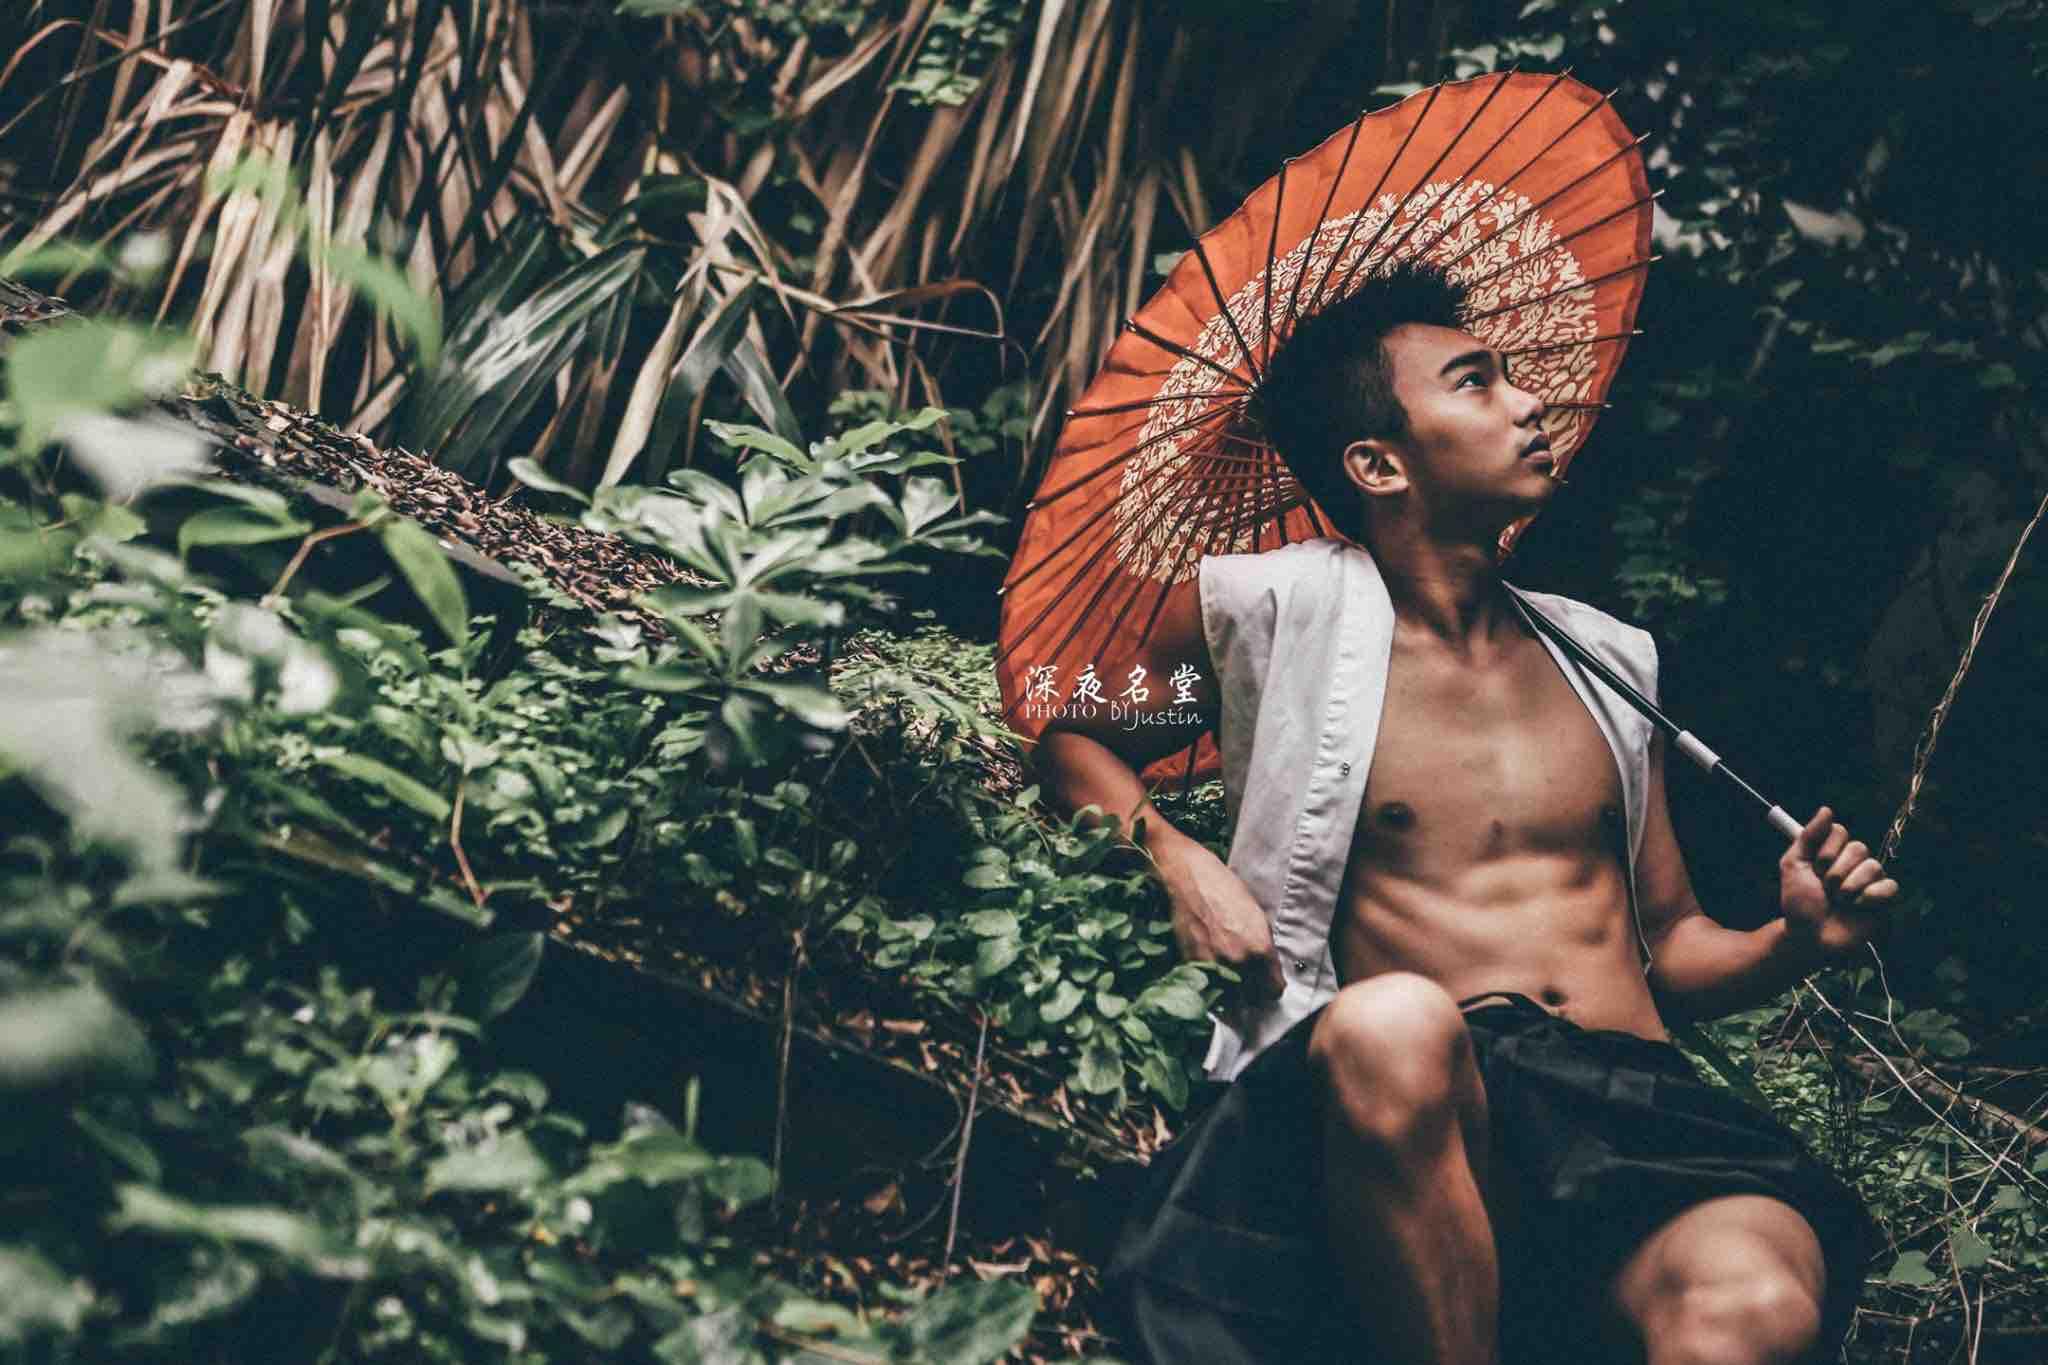 Justin Hsieh Photography Wildeness 2 - AspirantSG